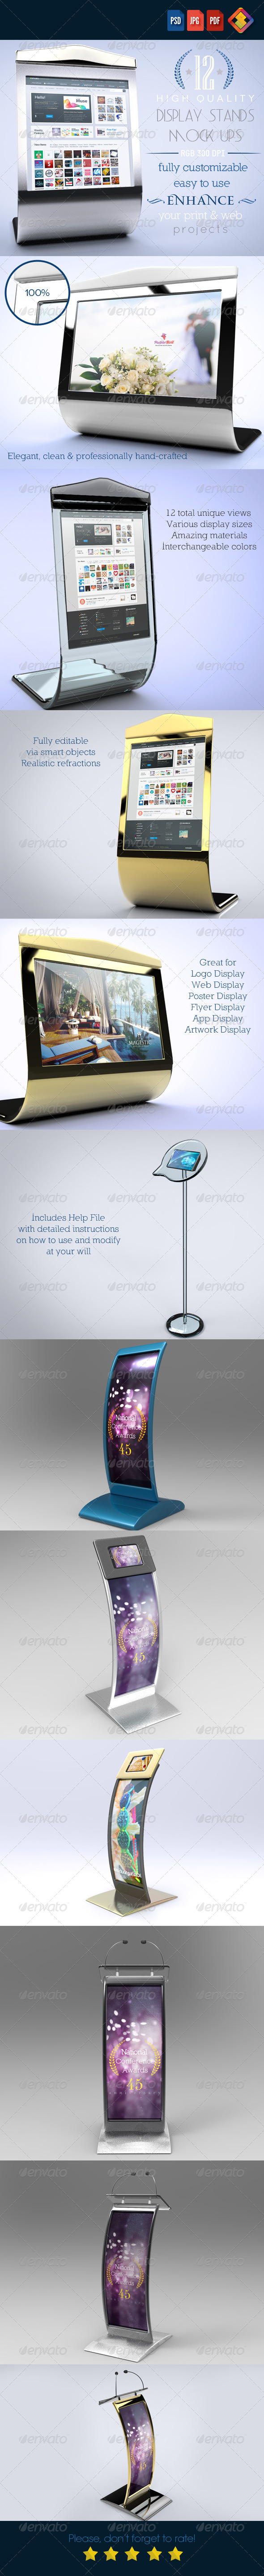 GraphicRiver 12 Luxury Display Stands Mock-Ups V.1 6426764